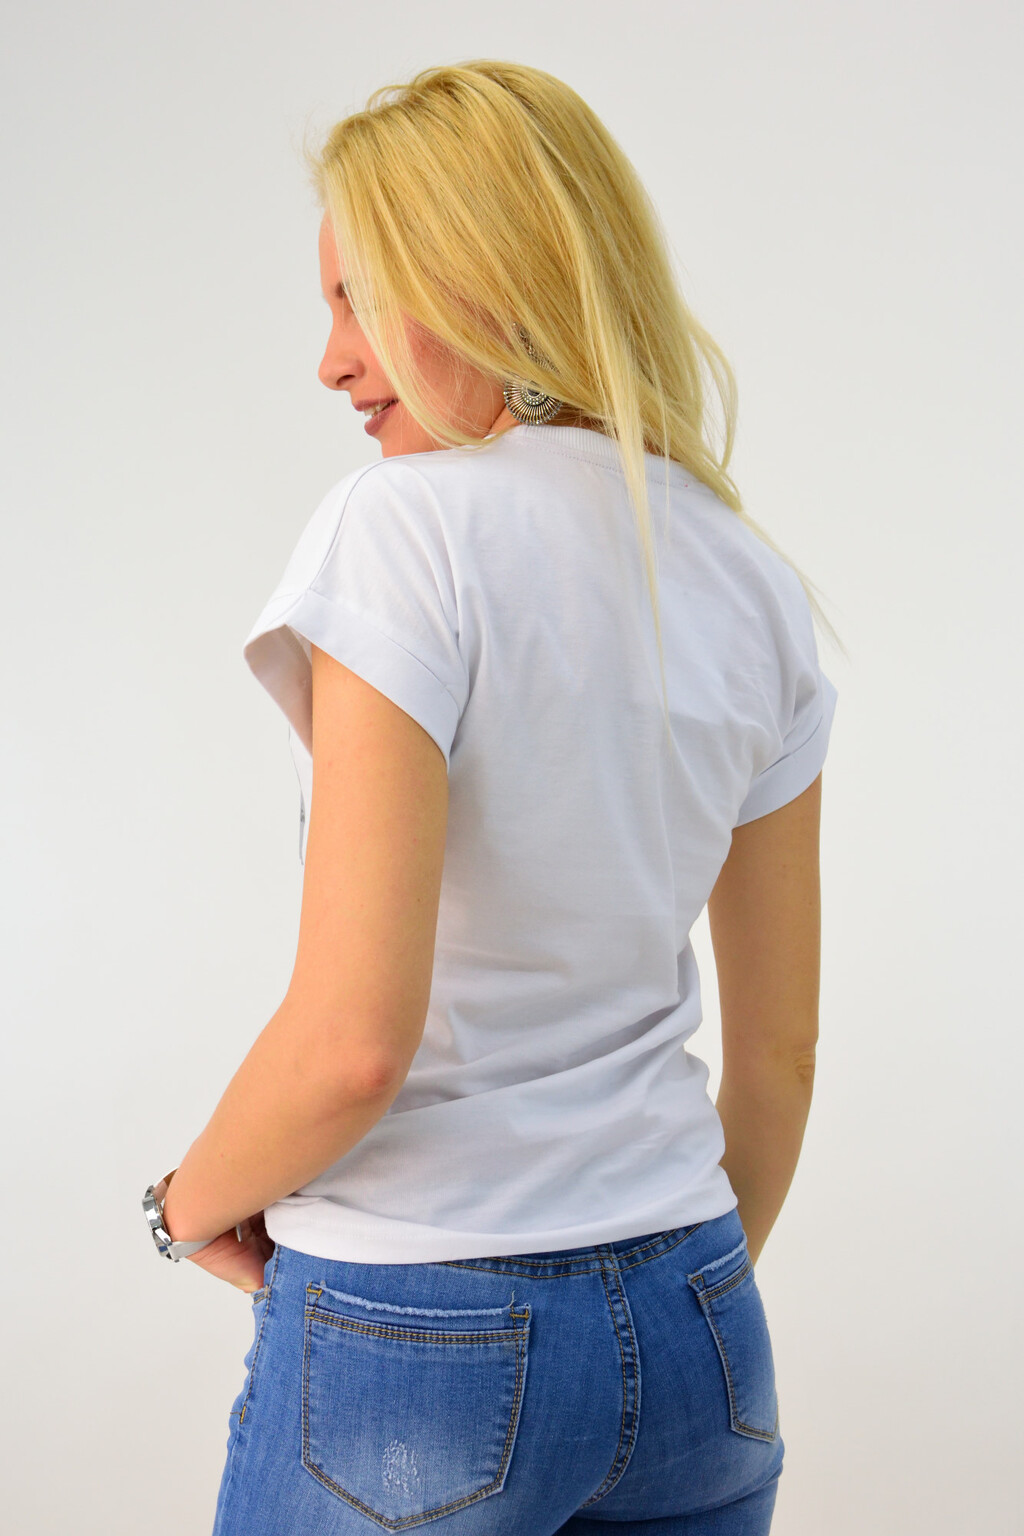 1acbcb8dce Γυναικείο t-shirt με φλούο τύπωμα